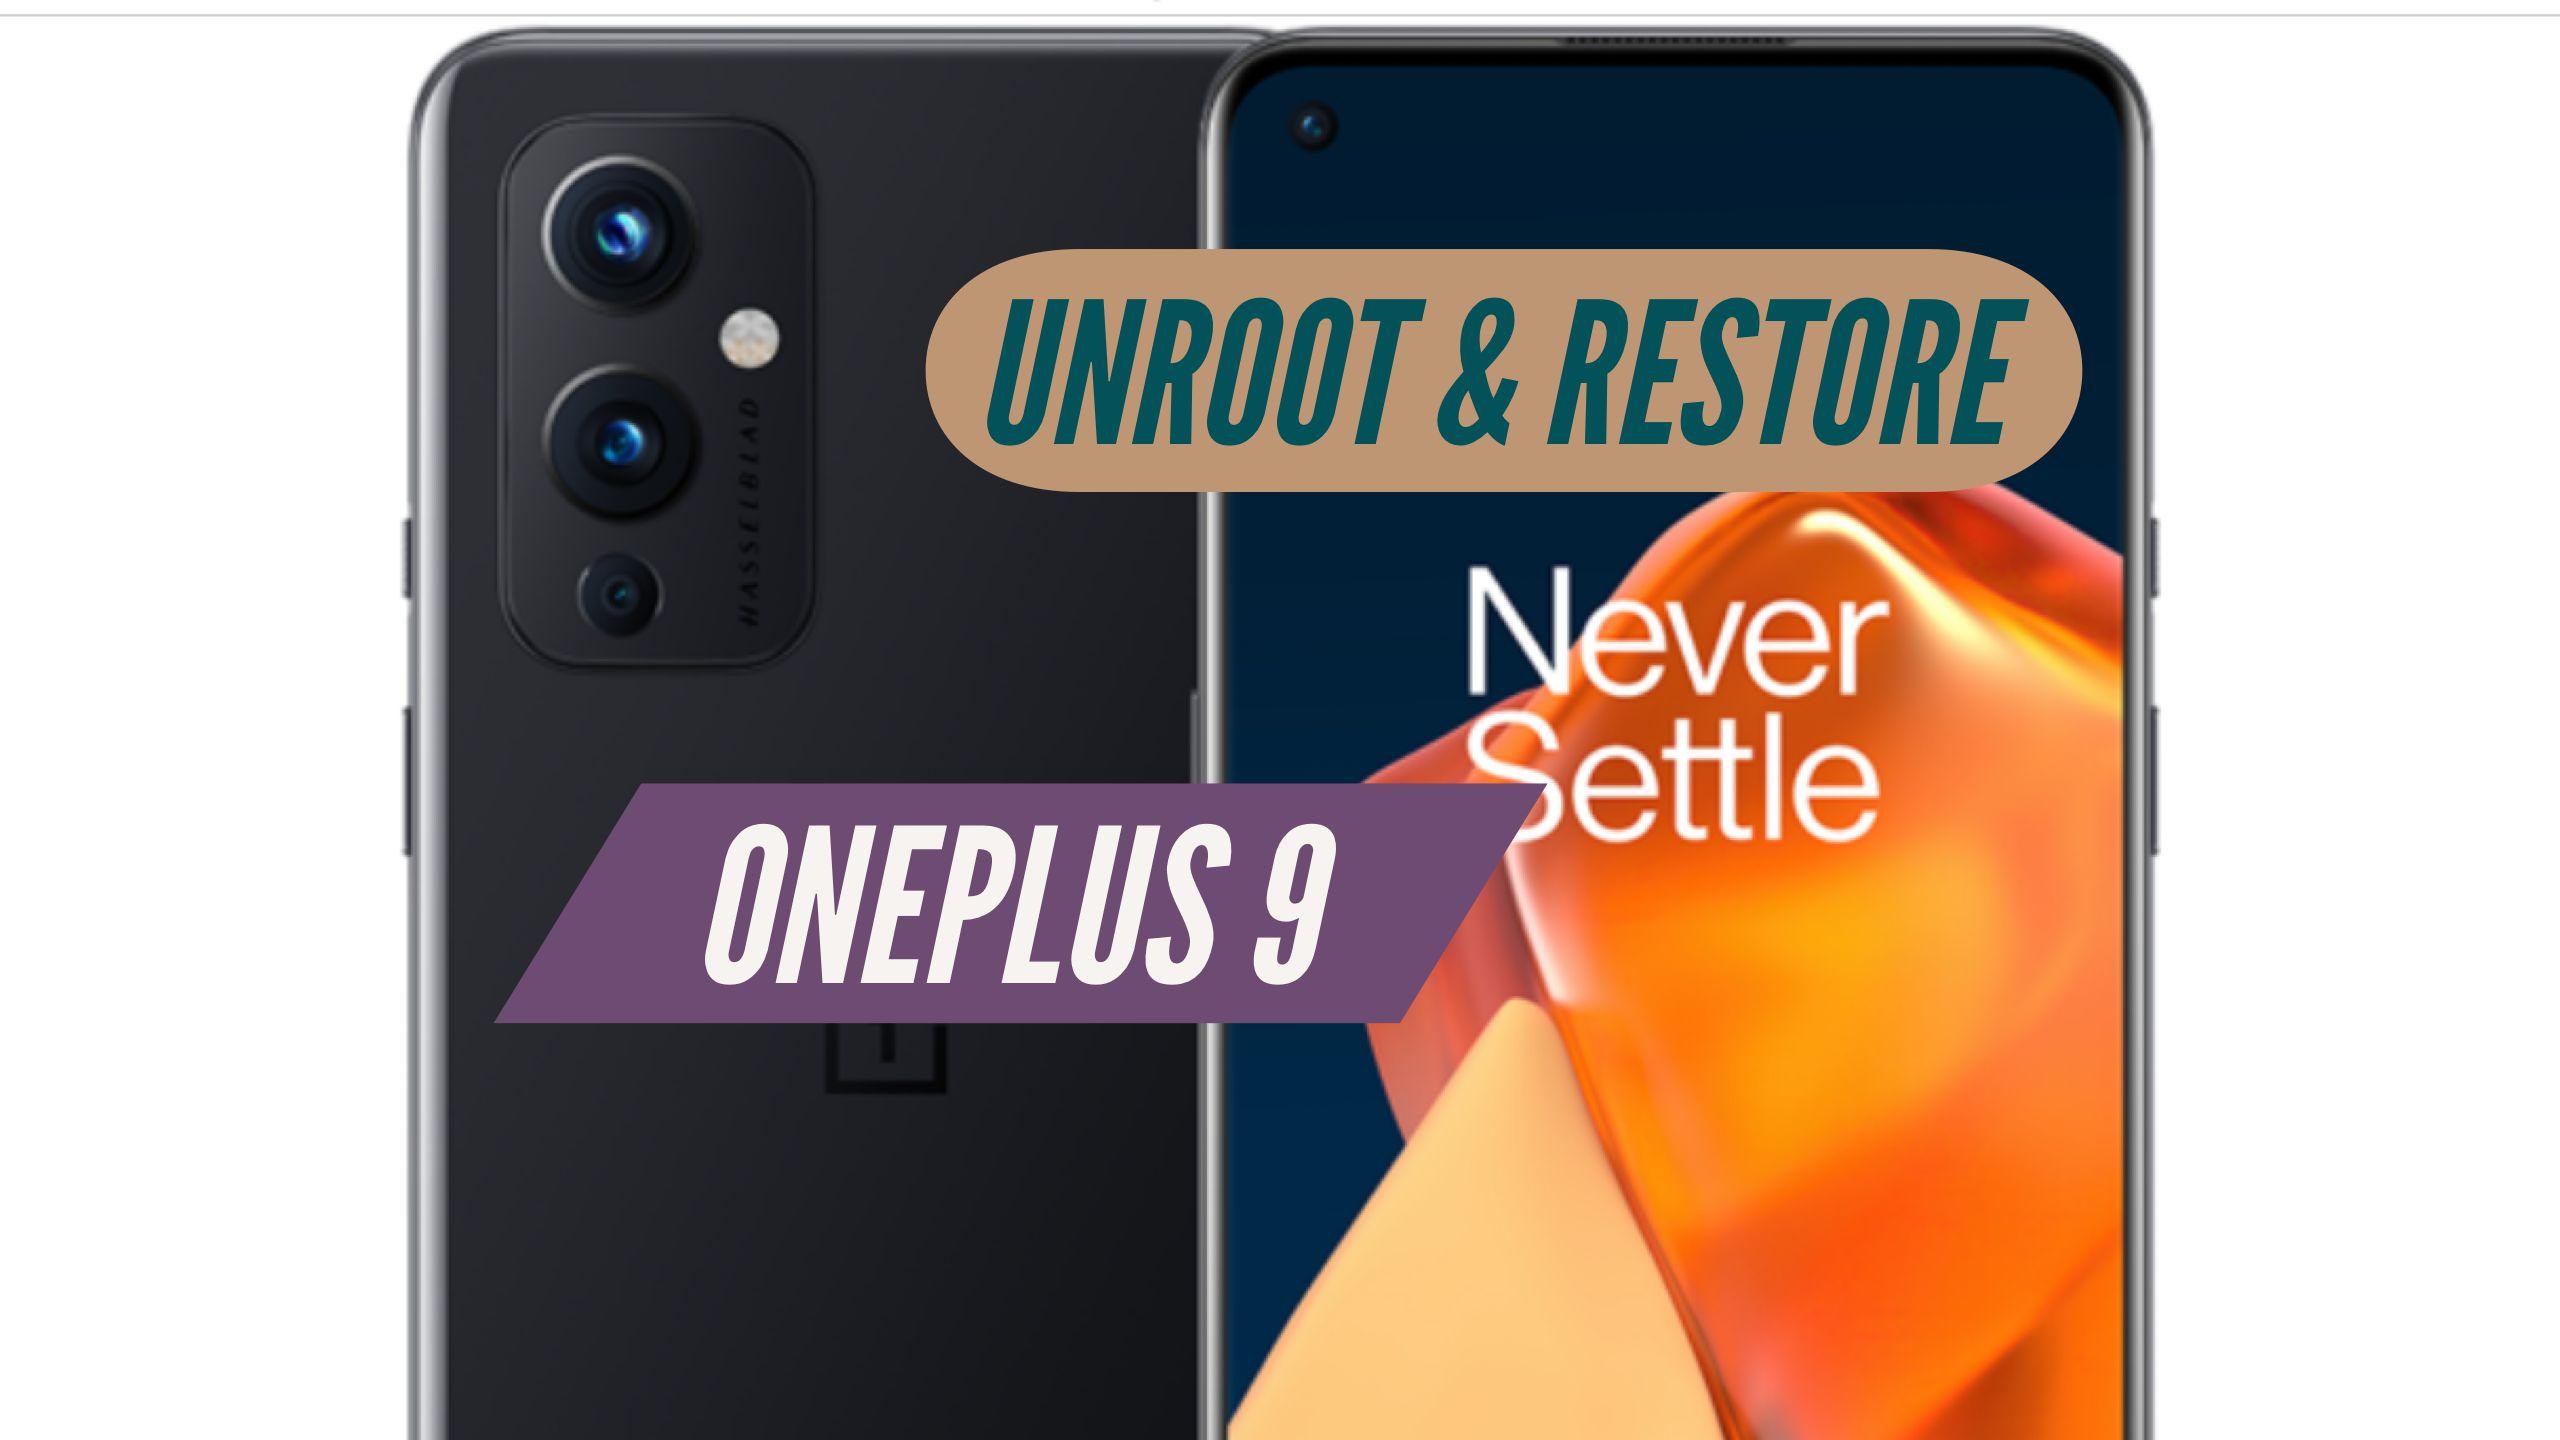 Unroot OnePlus 9 Restore